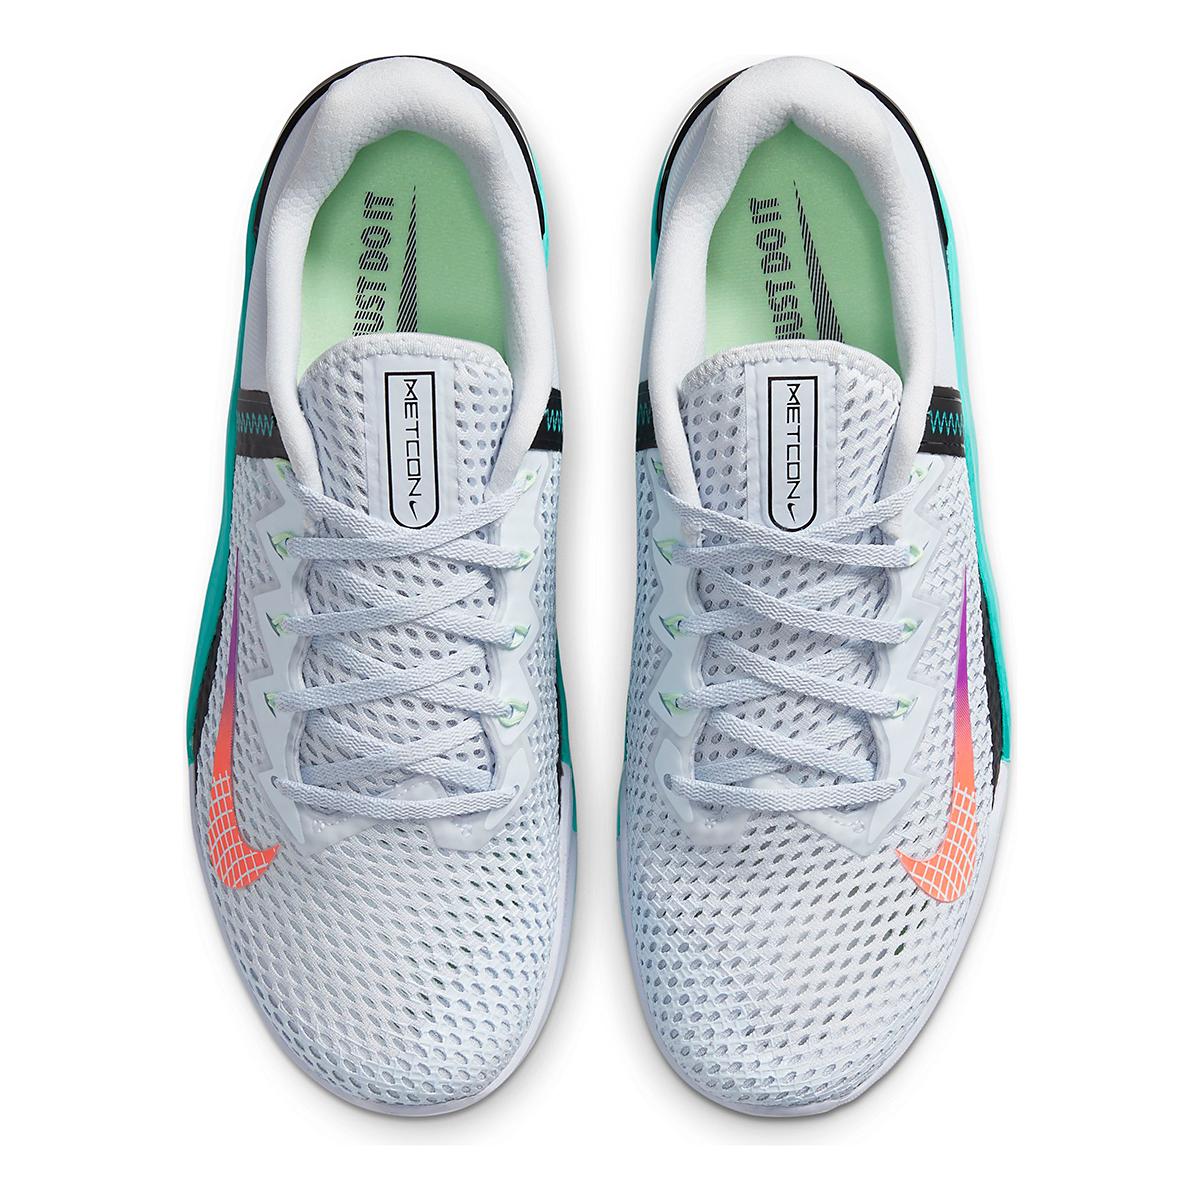 Men's Nike Nike Metcon 6 Training Shoes - Color: Football Grey/Hyper Jade/Black/Flash Crimson - Size: 3.5 - Width: Regular, Football Grey/Hyper Jade/Black/Flash Crimson, large, image 4